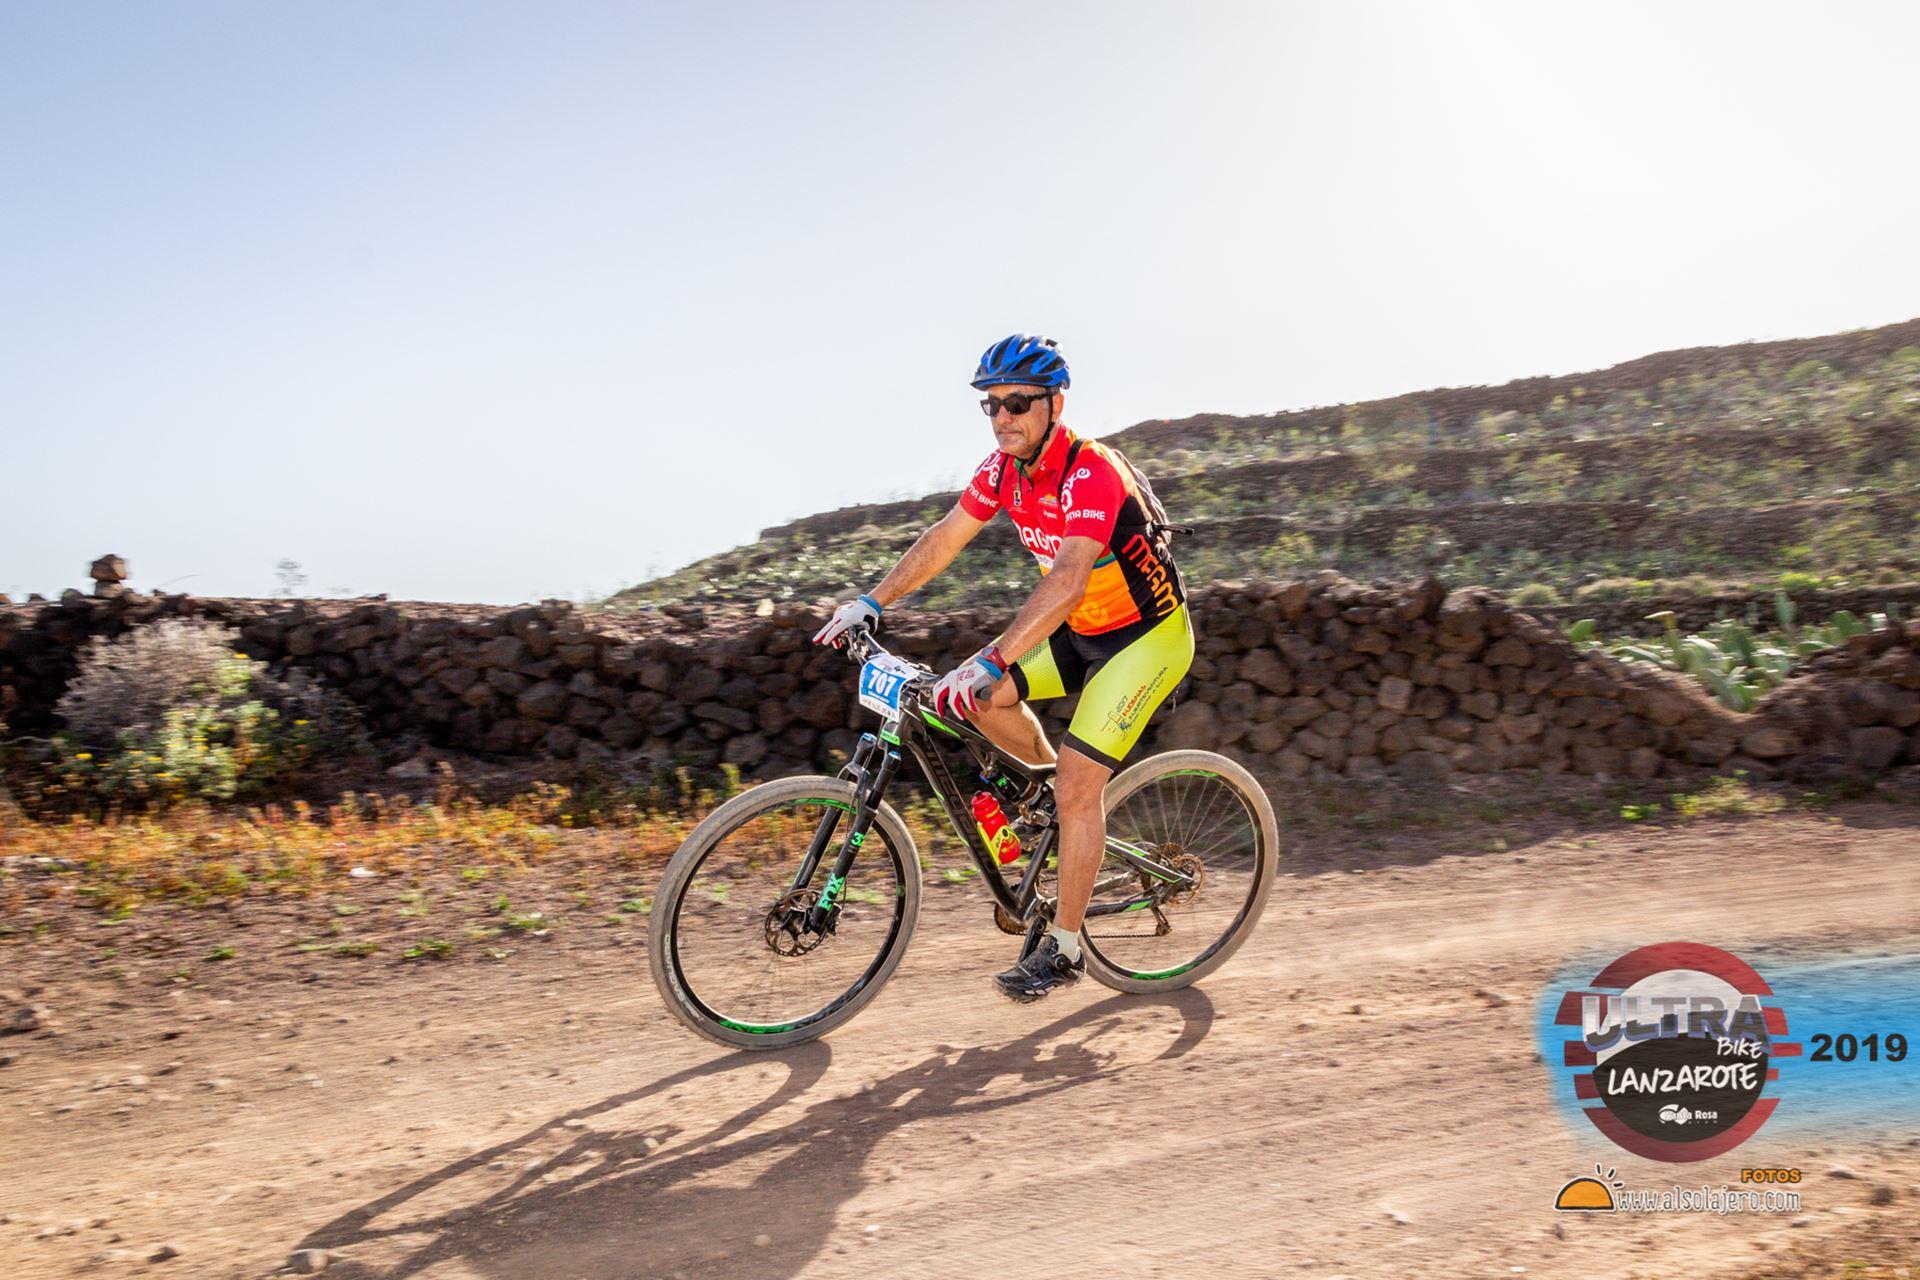 Sector Guatiza 2ª Etapa Ultrabike 2019 Fotos Alsolajero.com-195